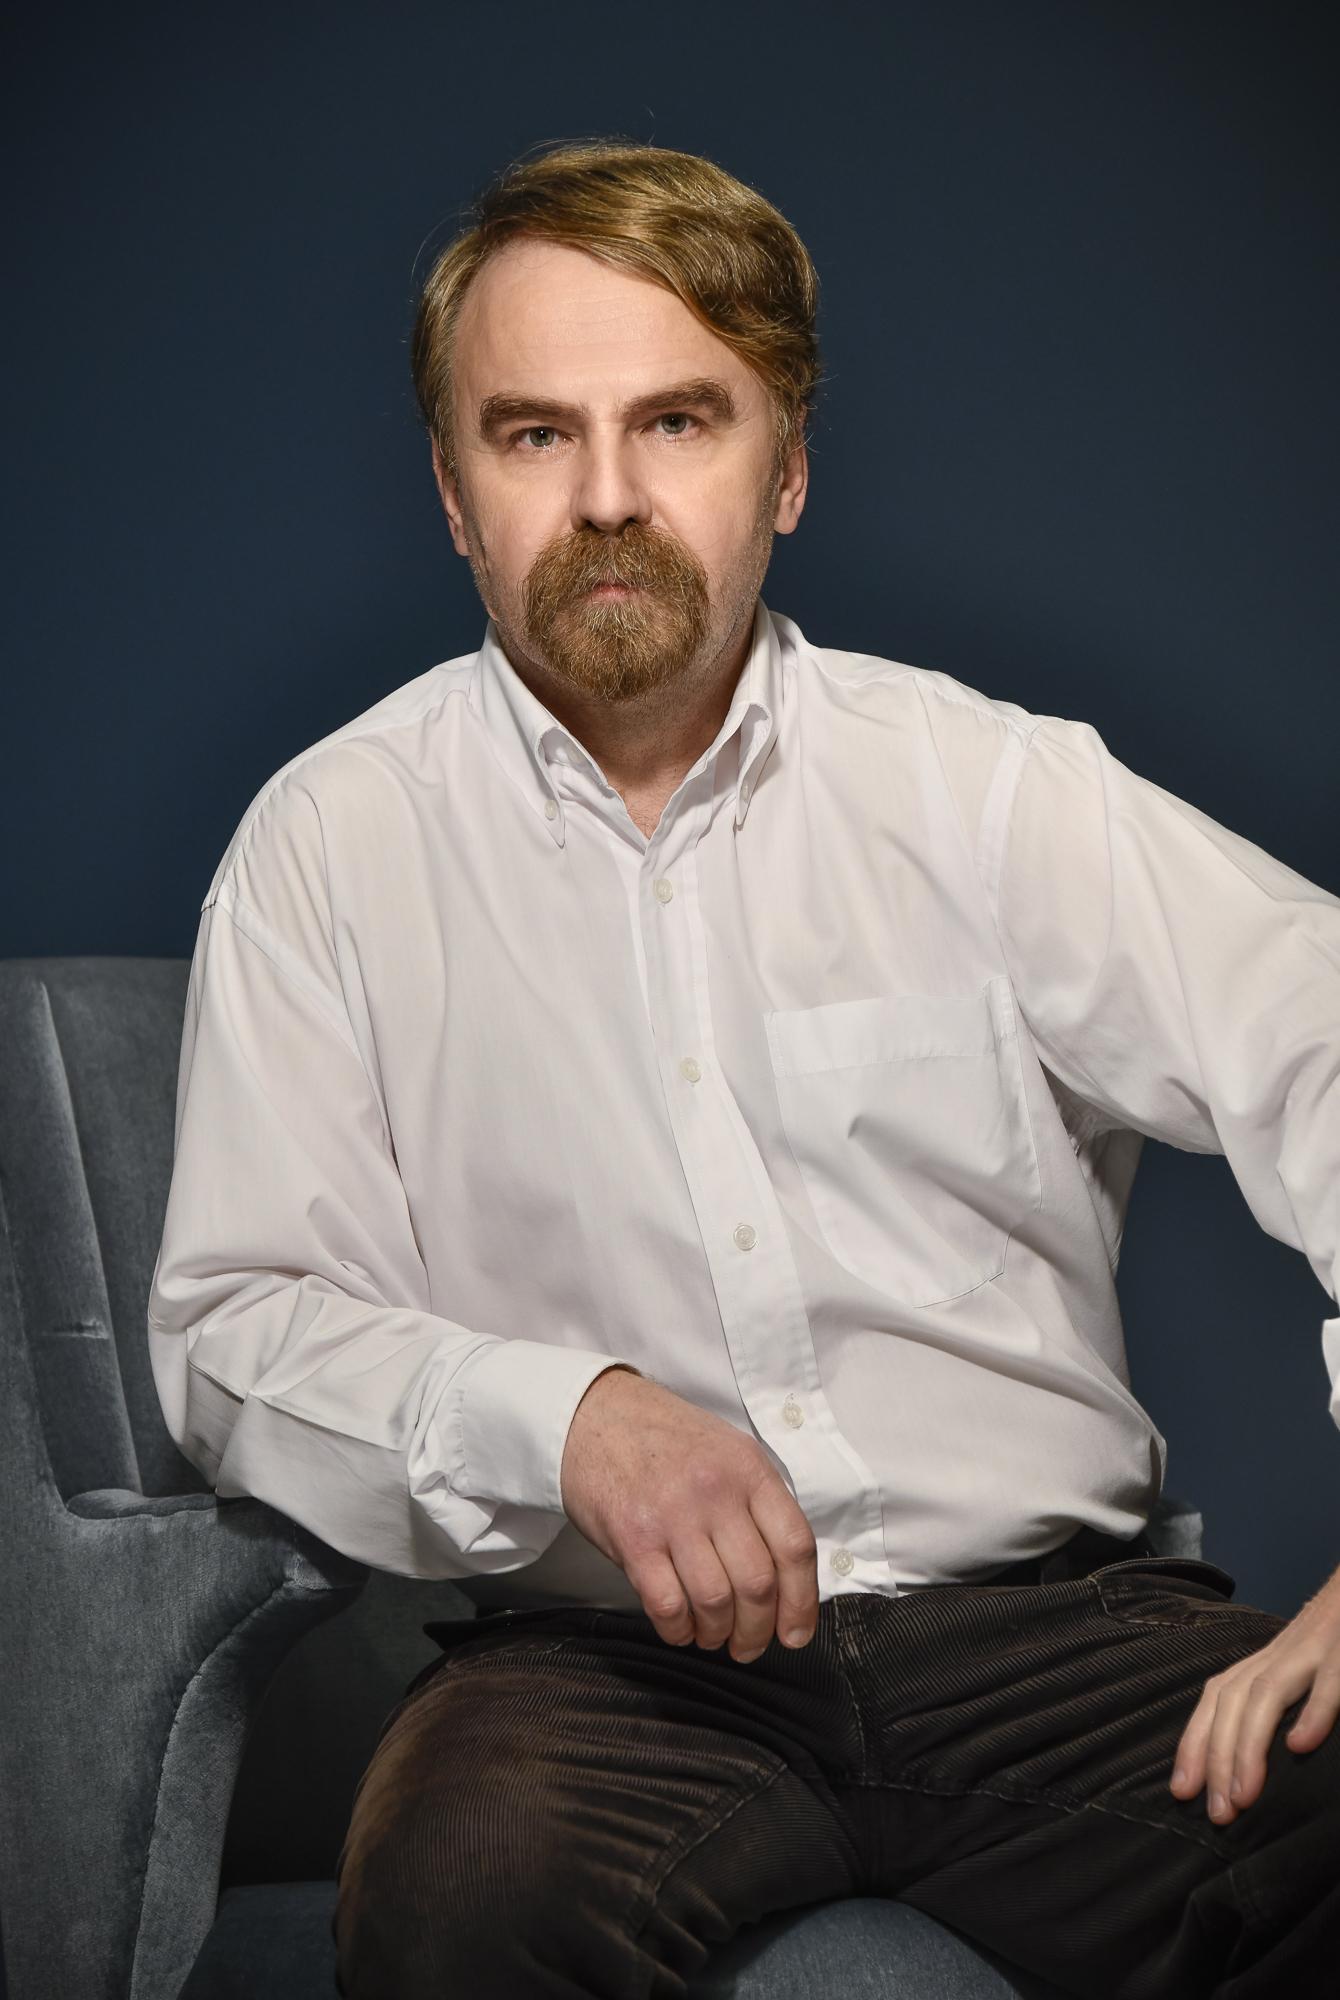 Štěpán Harasim